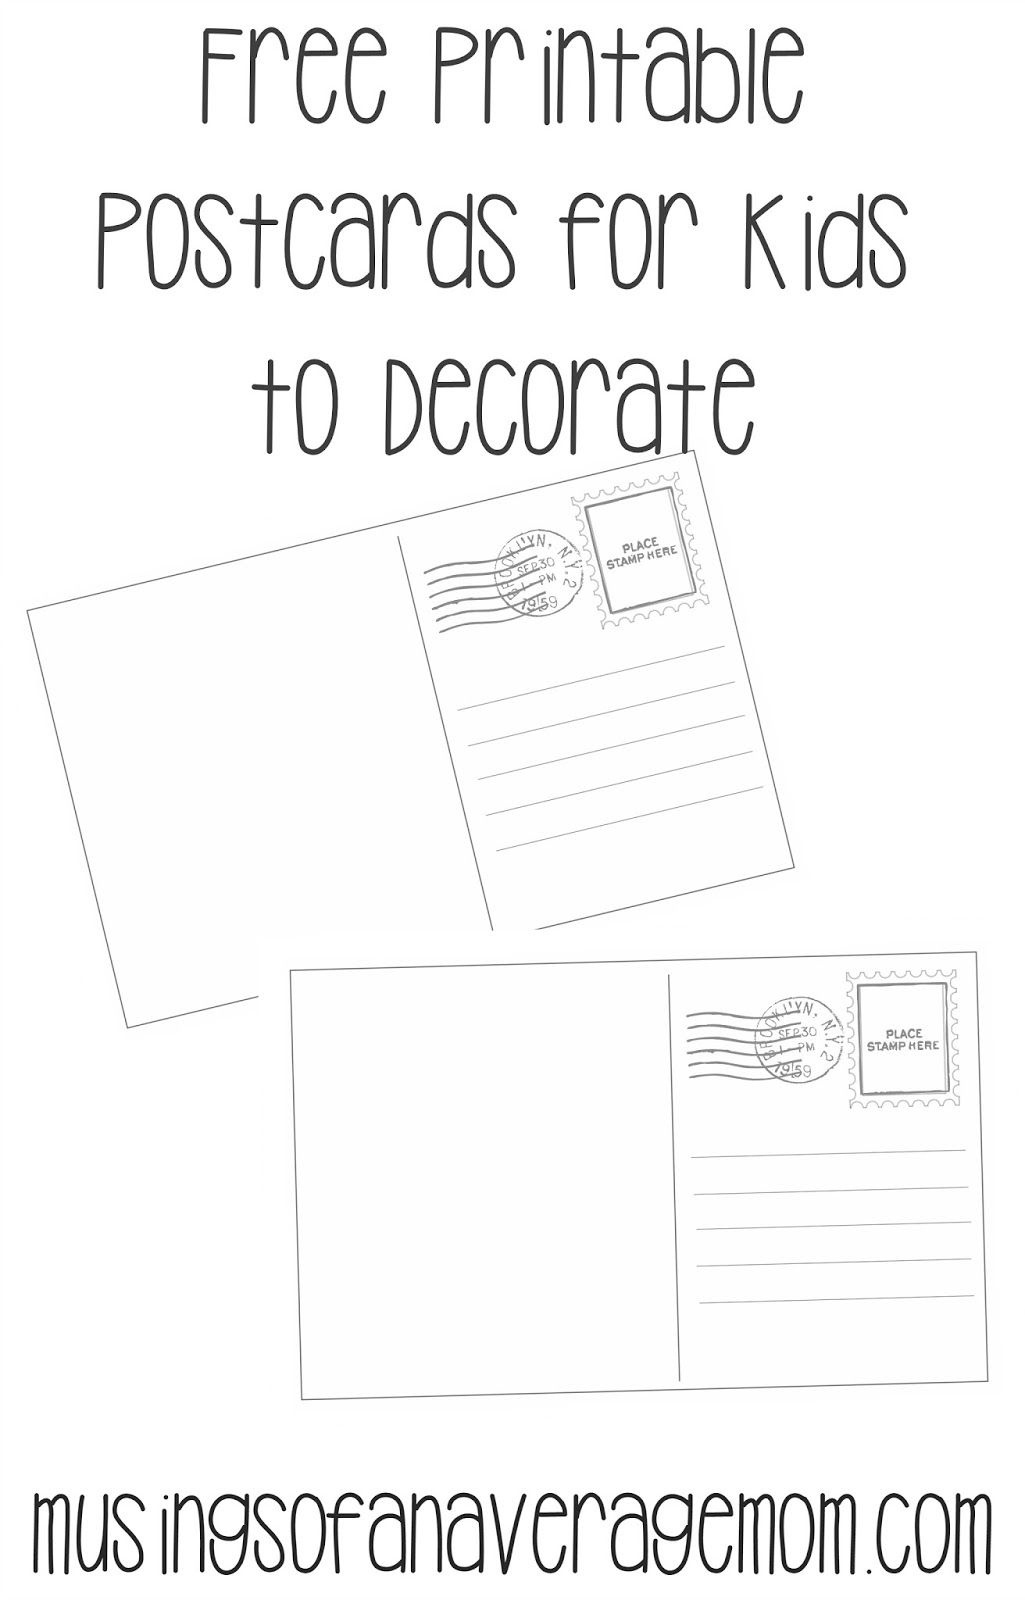 Postcard Templates | Printable Worksheets | Printable Postcards - Free Blank Printable Postcards